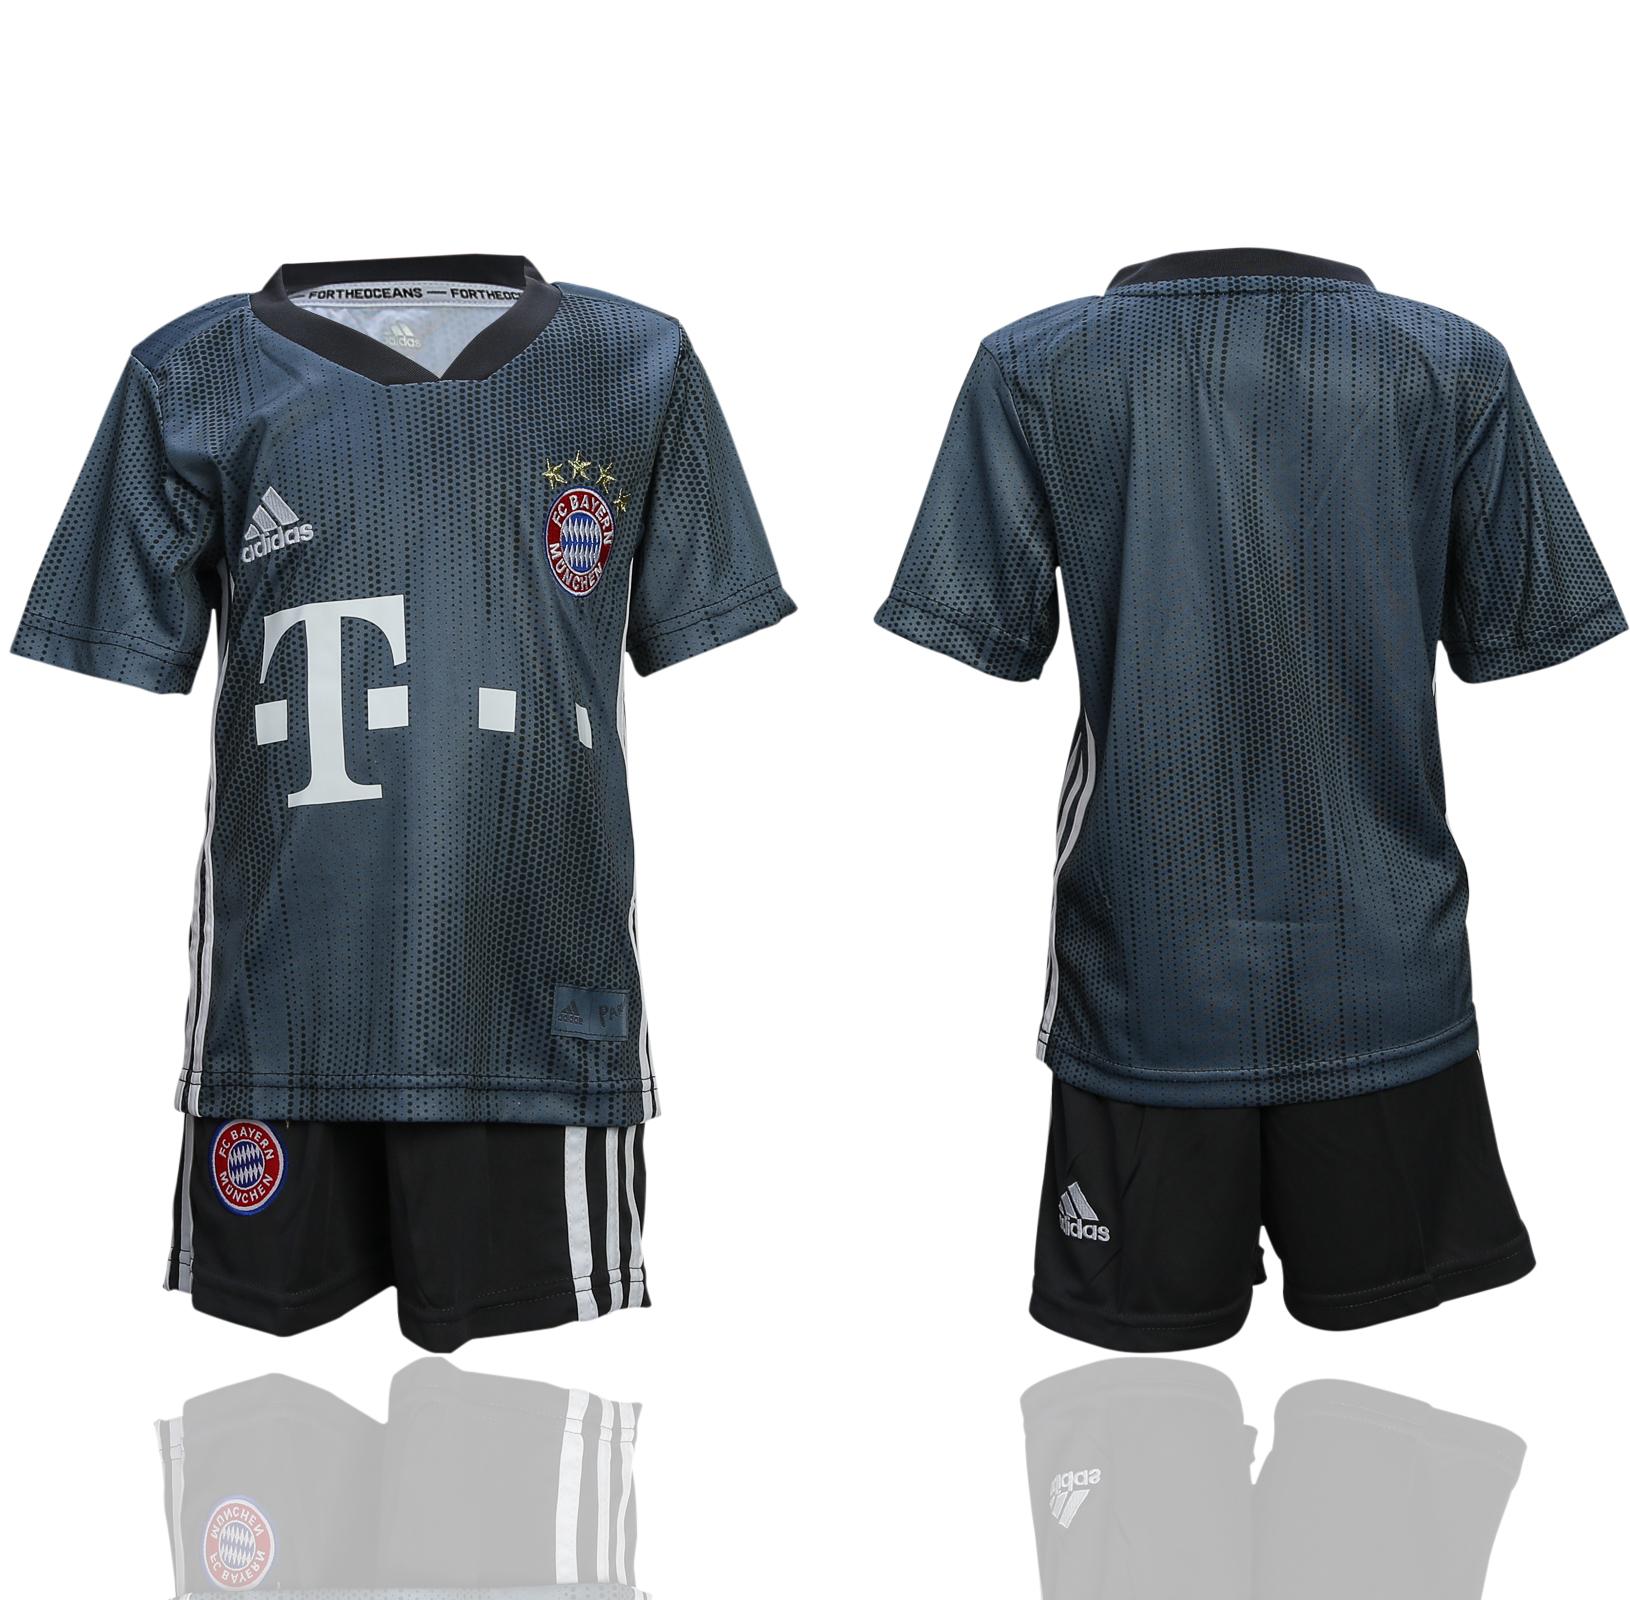 2018-19 Bayern Munich Third Away Youth Soccer Jersey